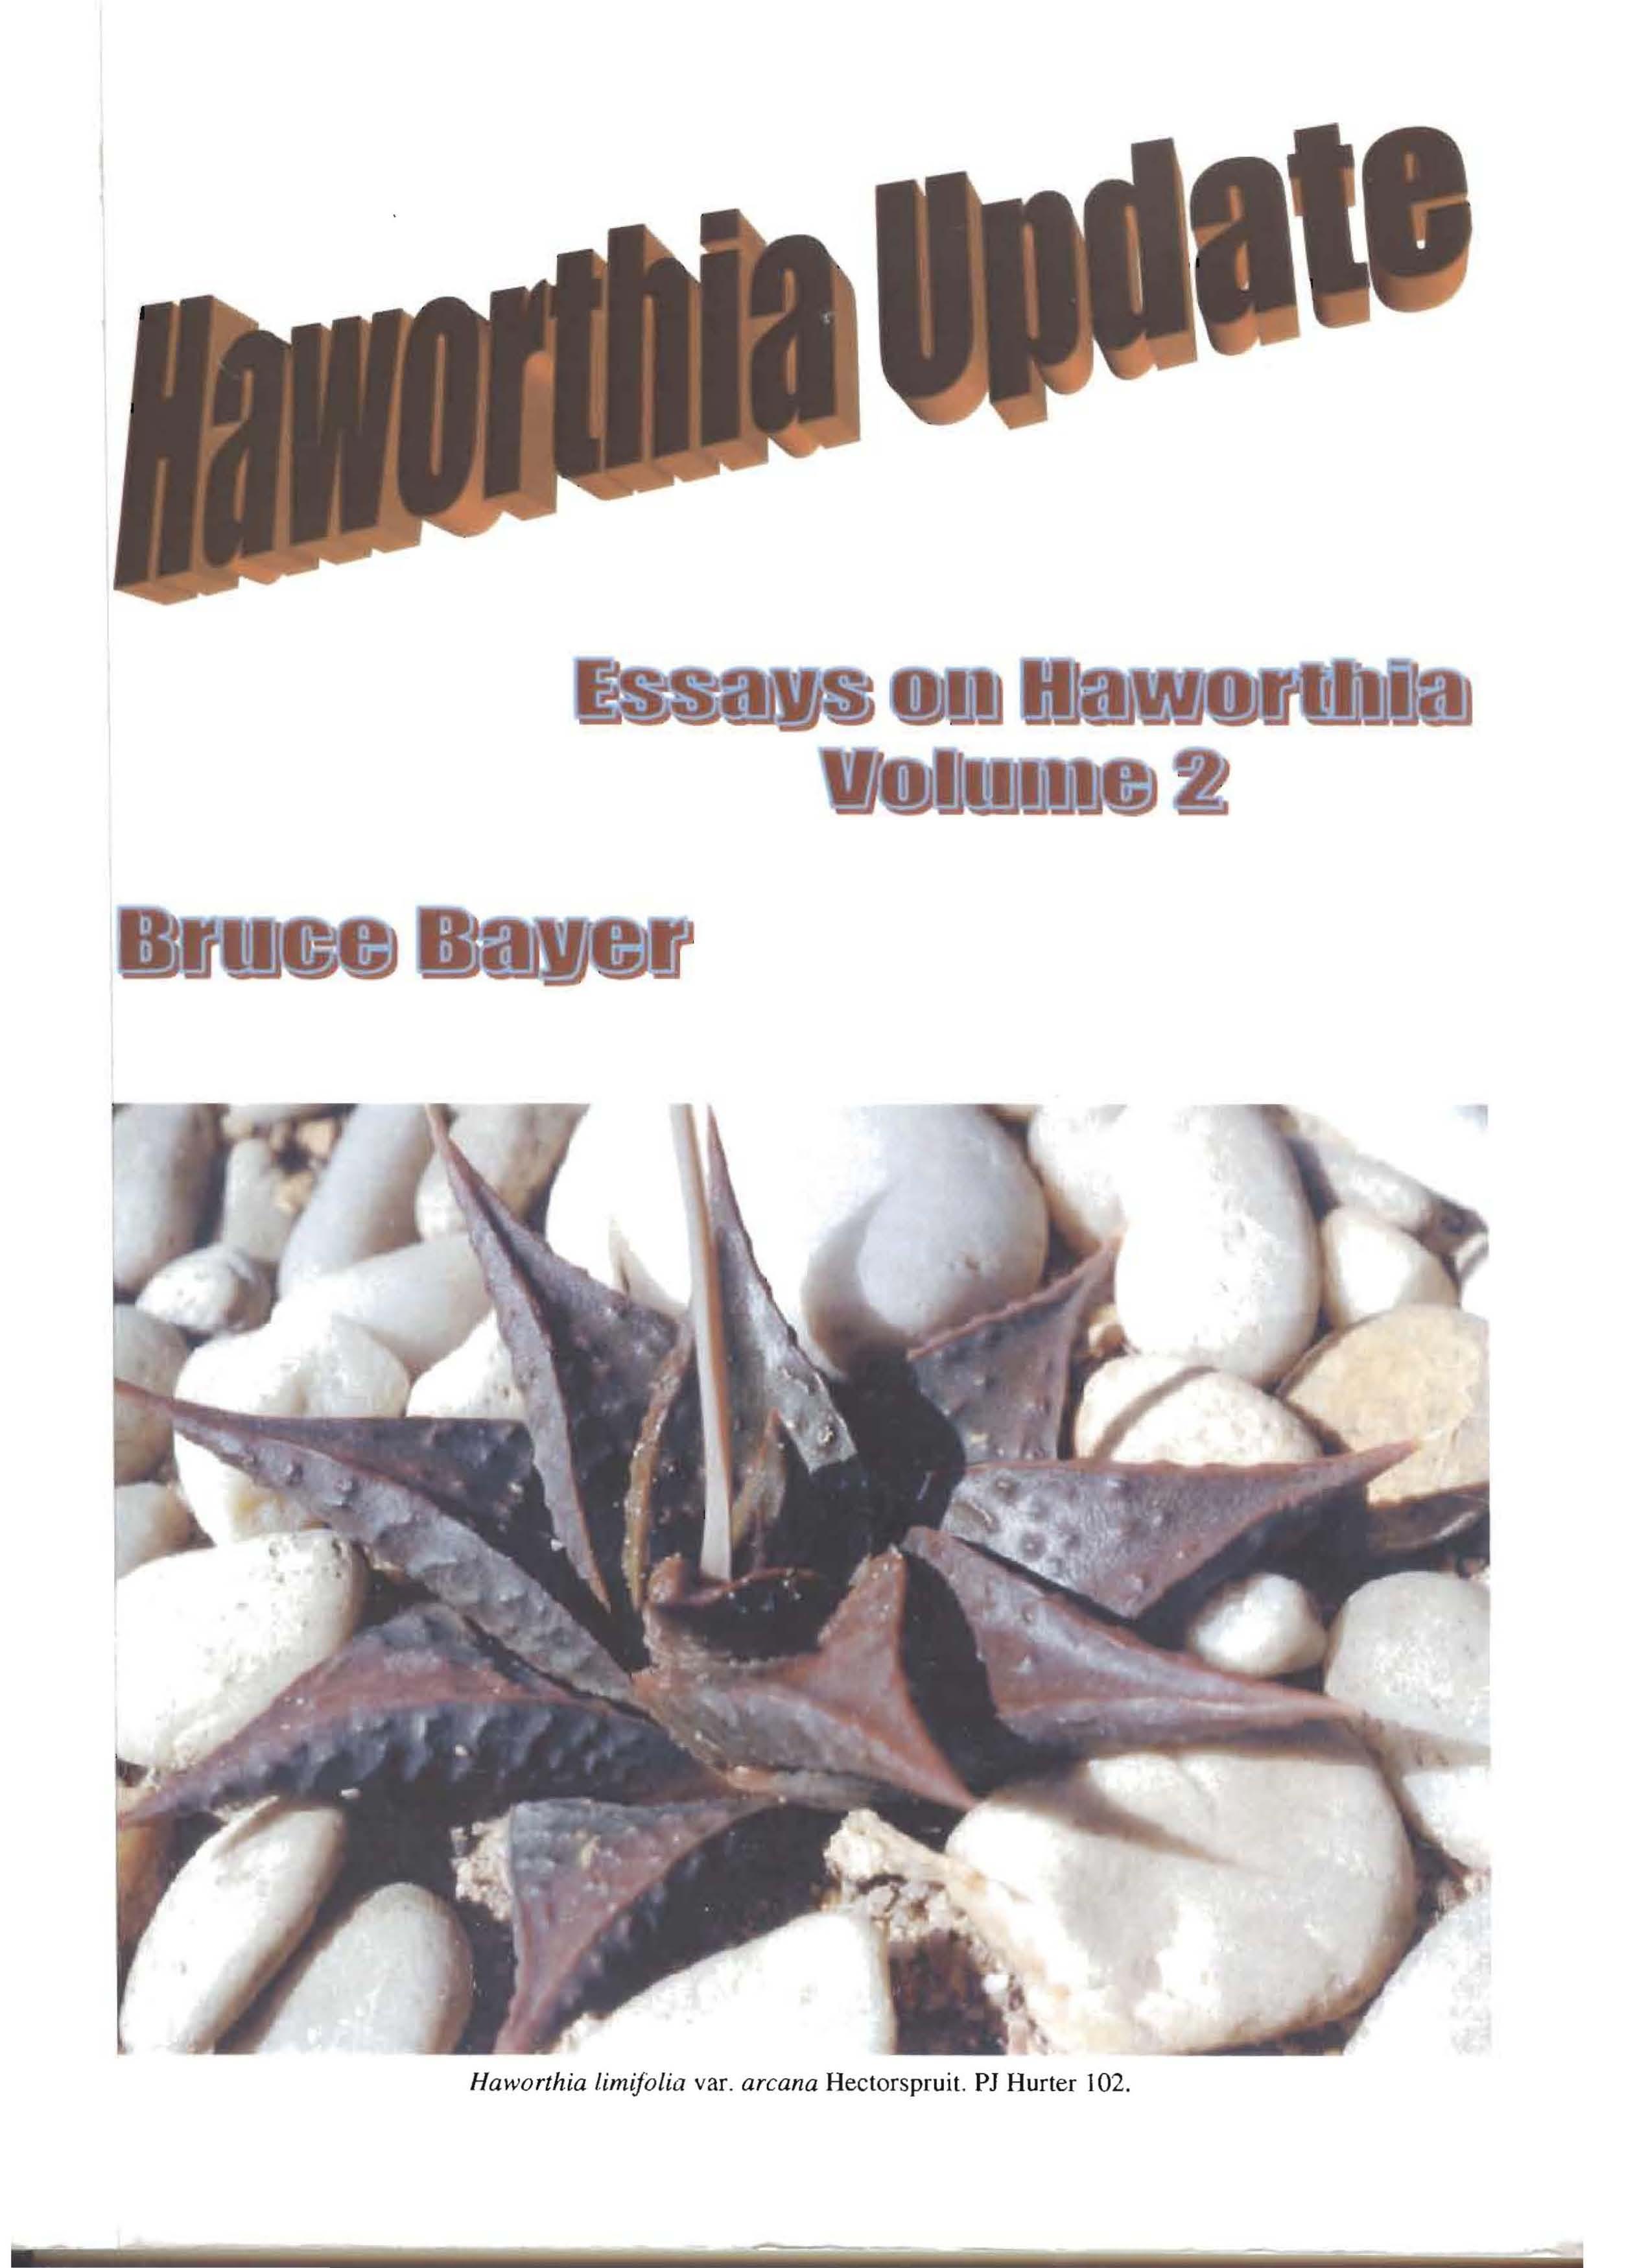 Haworthia Updates vol. 2